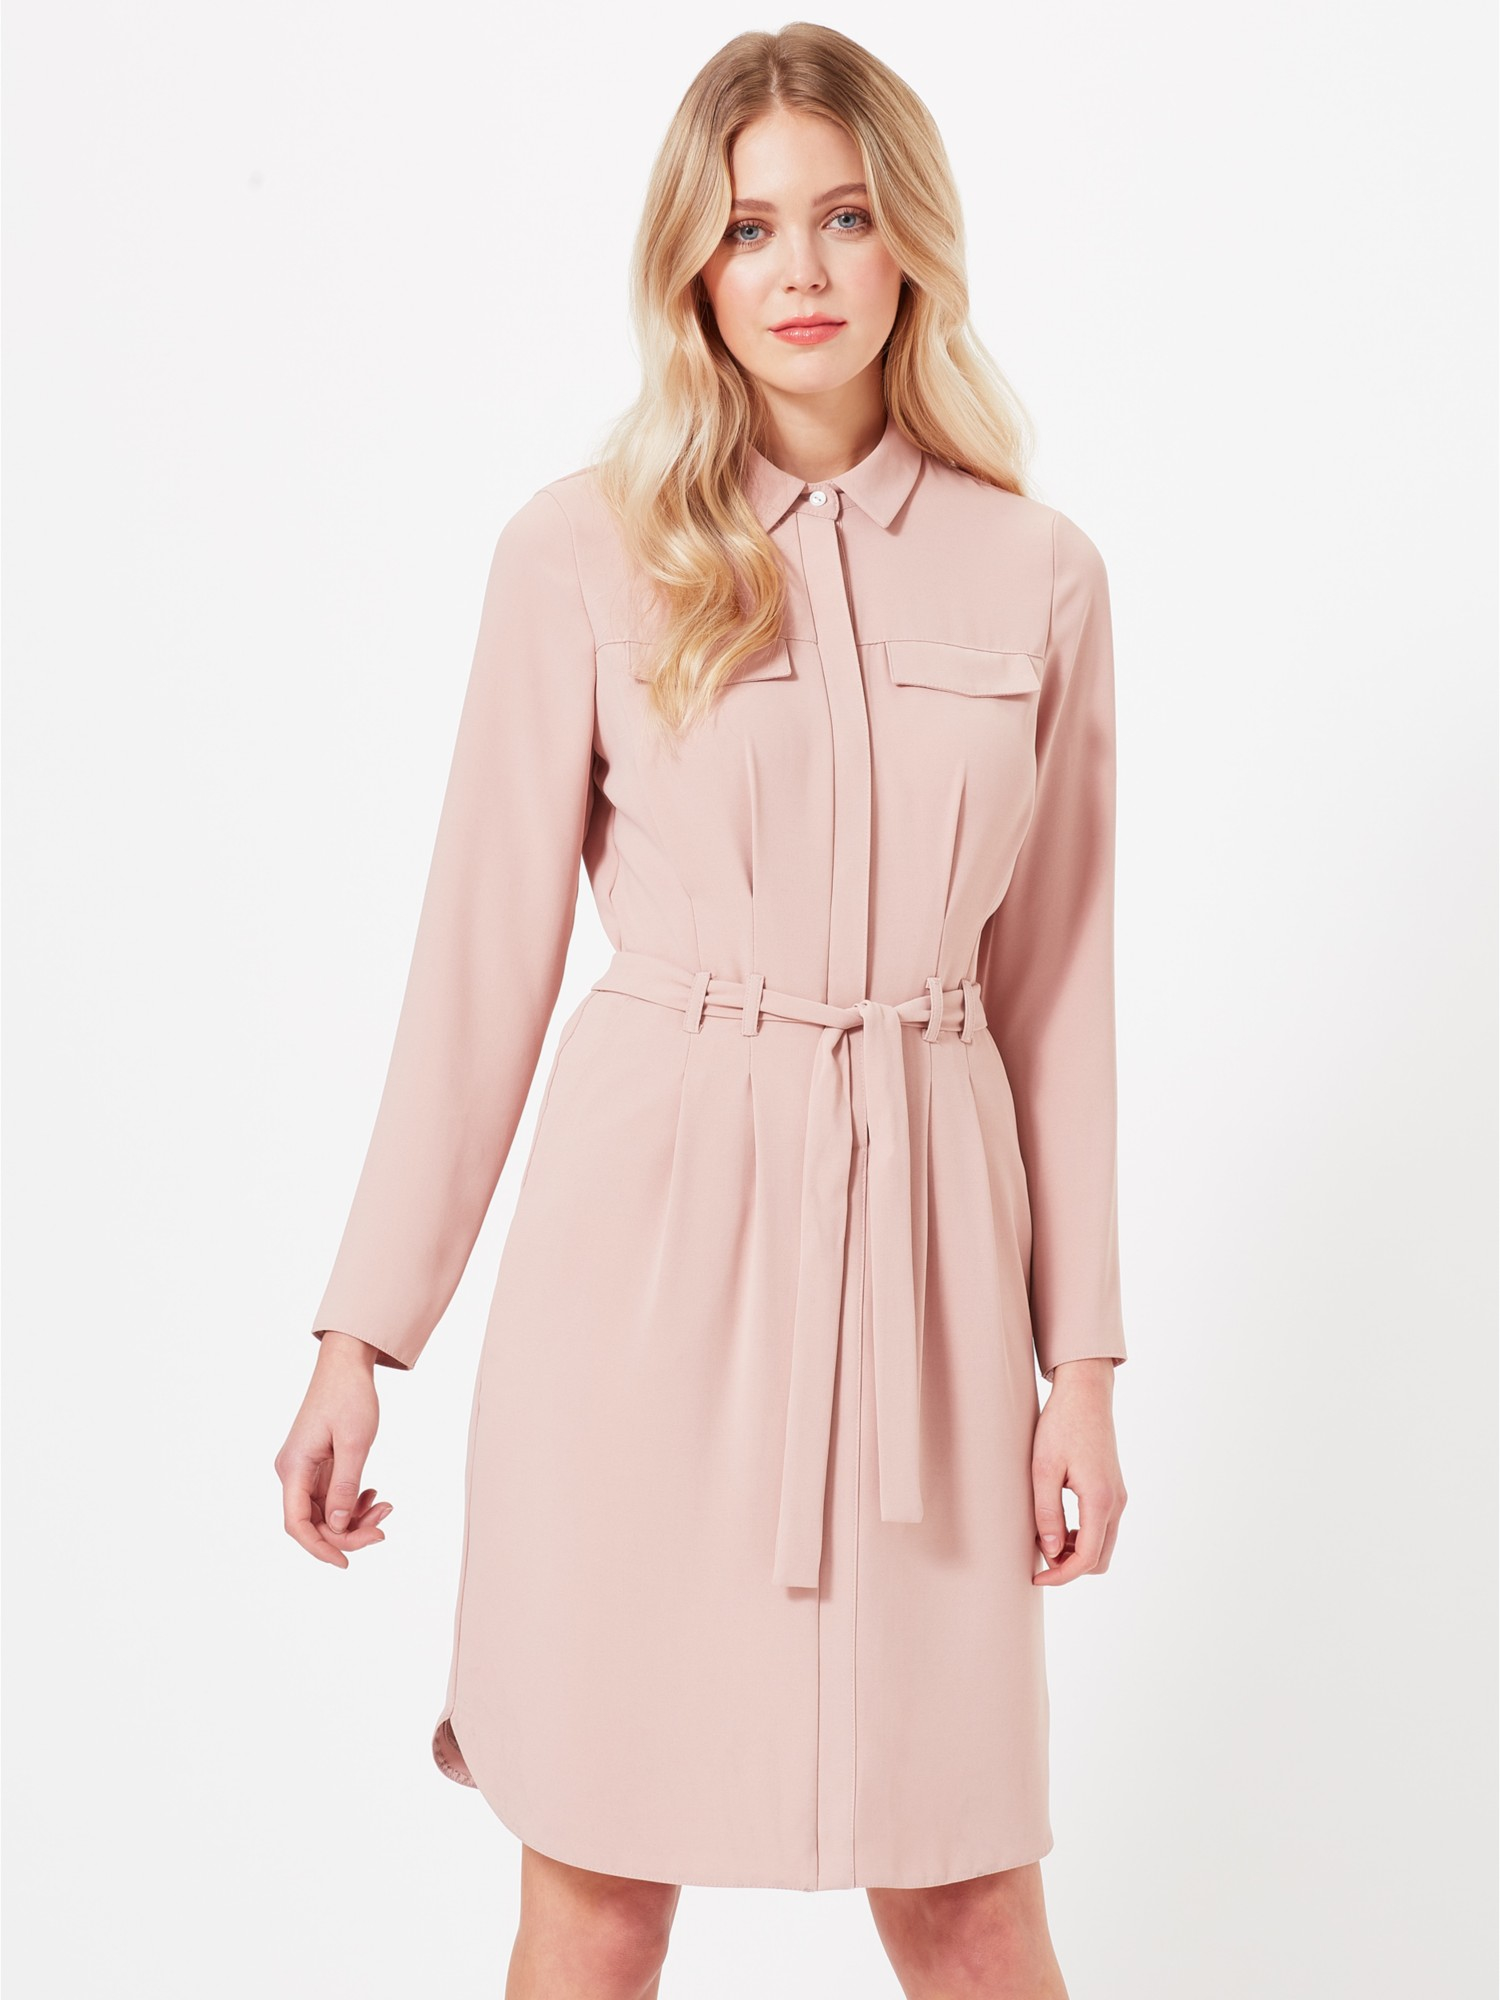 553d290bee24 Miss Selfridge Tie Up Shirt Dress in Pink - Lyst